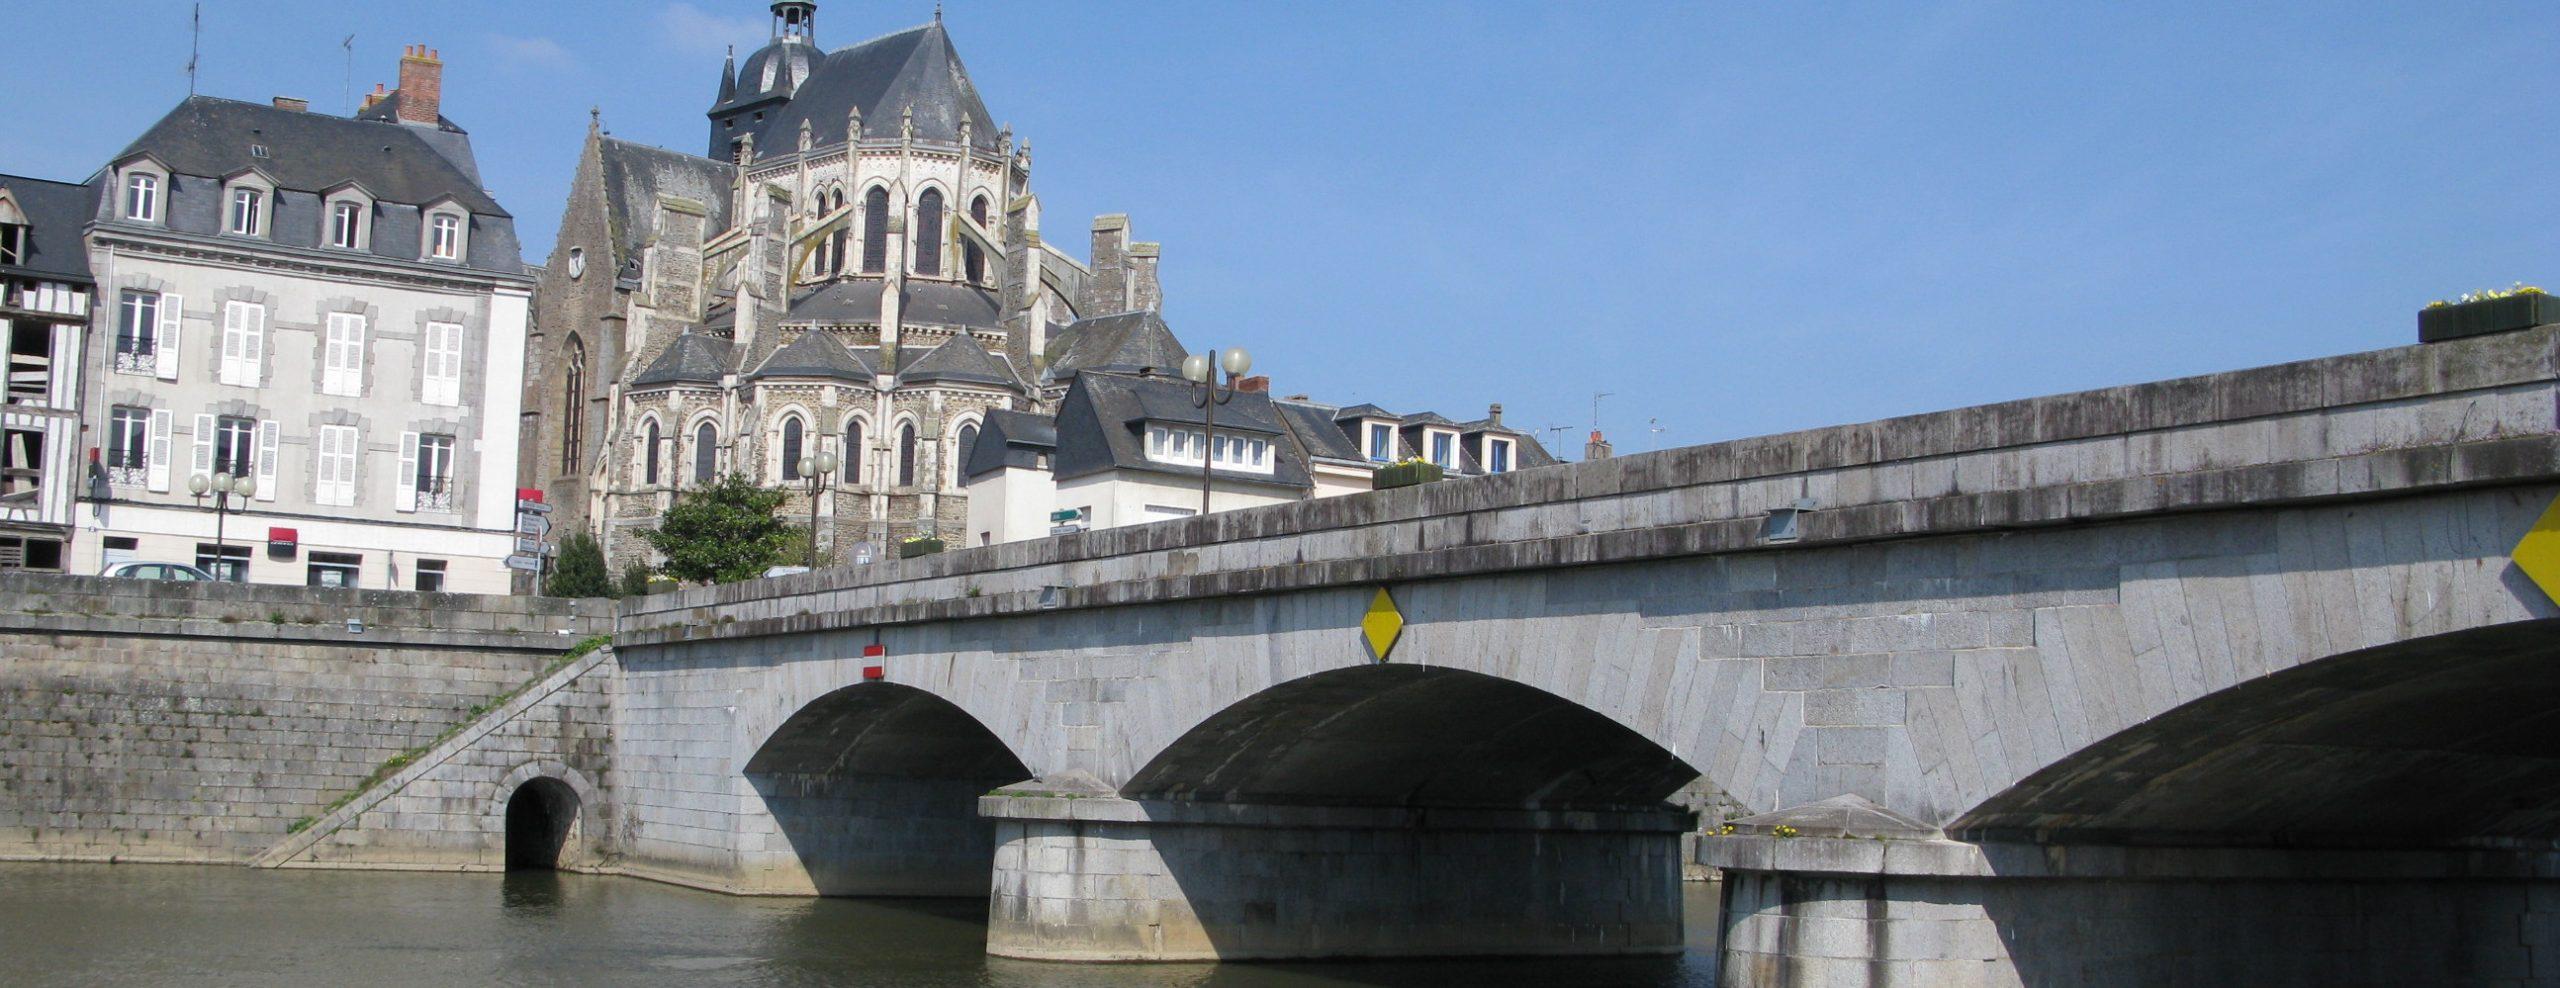 Mayenne_-_Pont_Notre-Dame